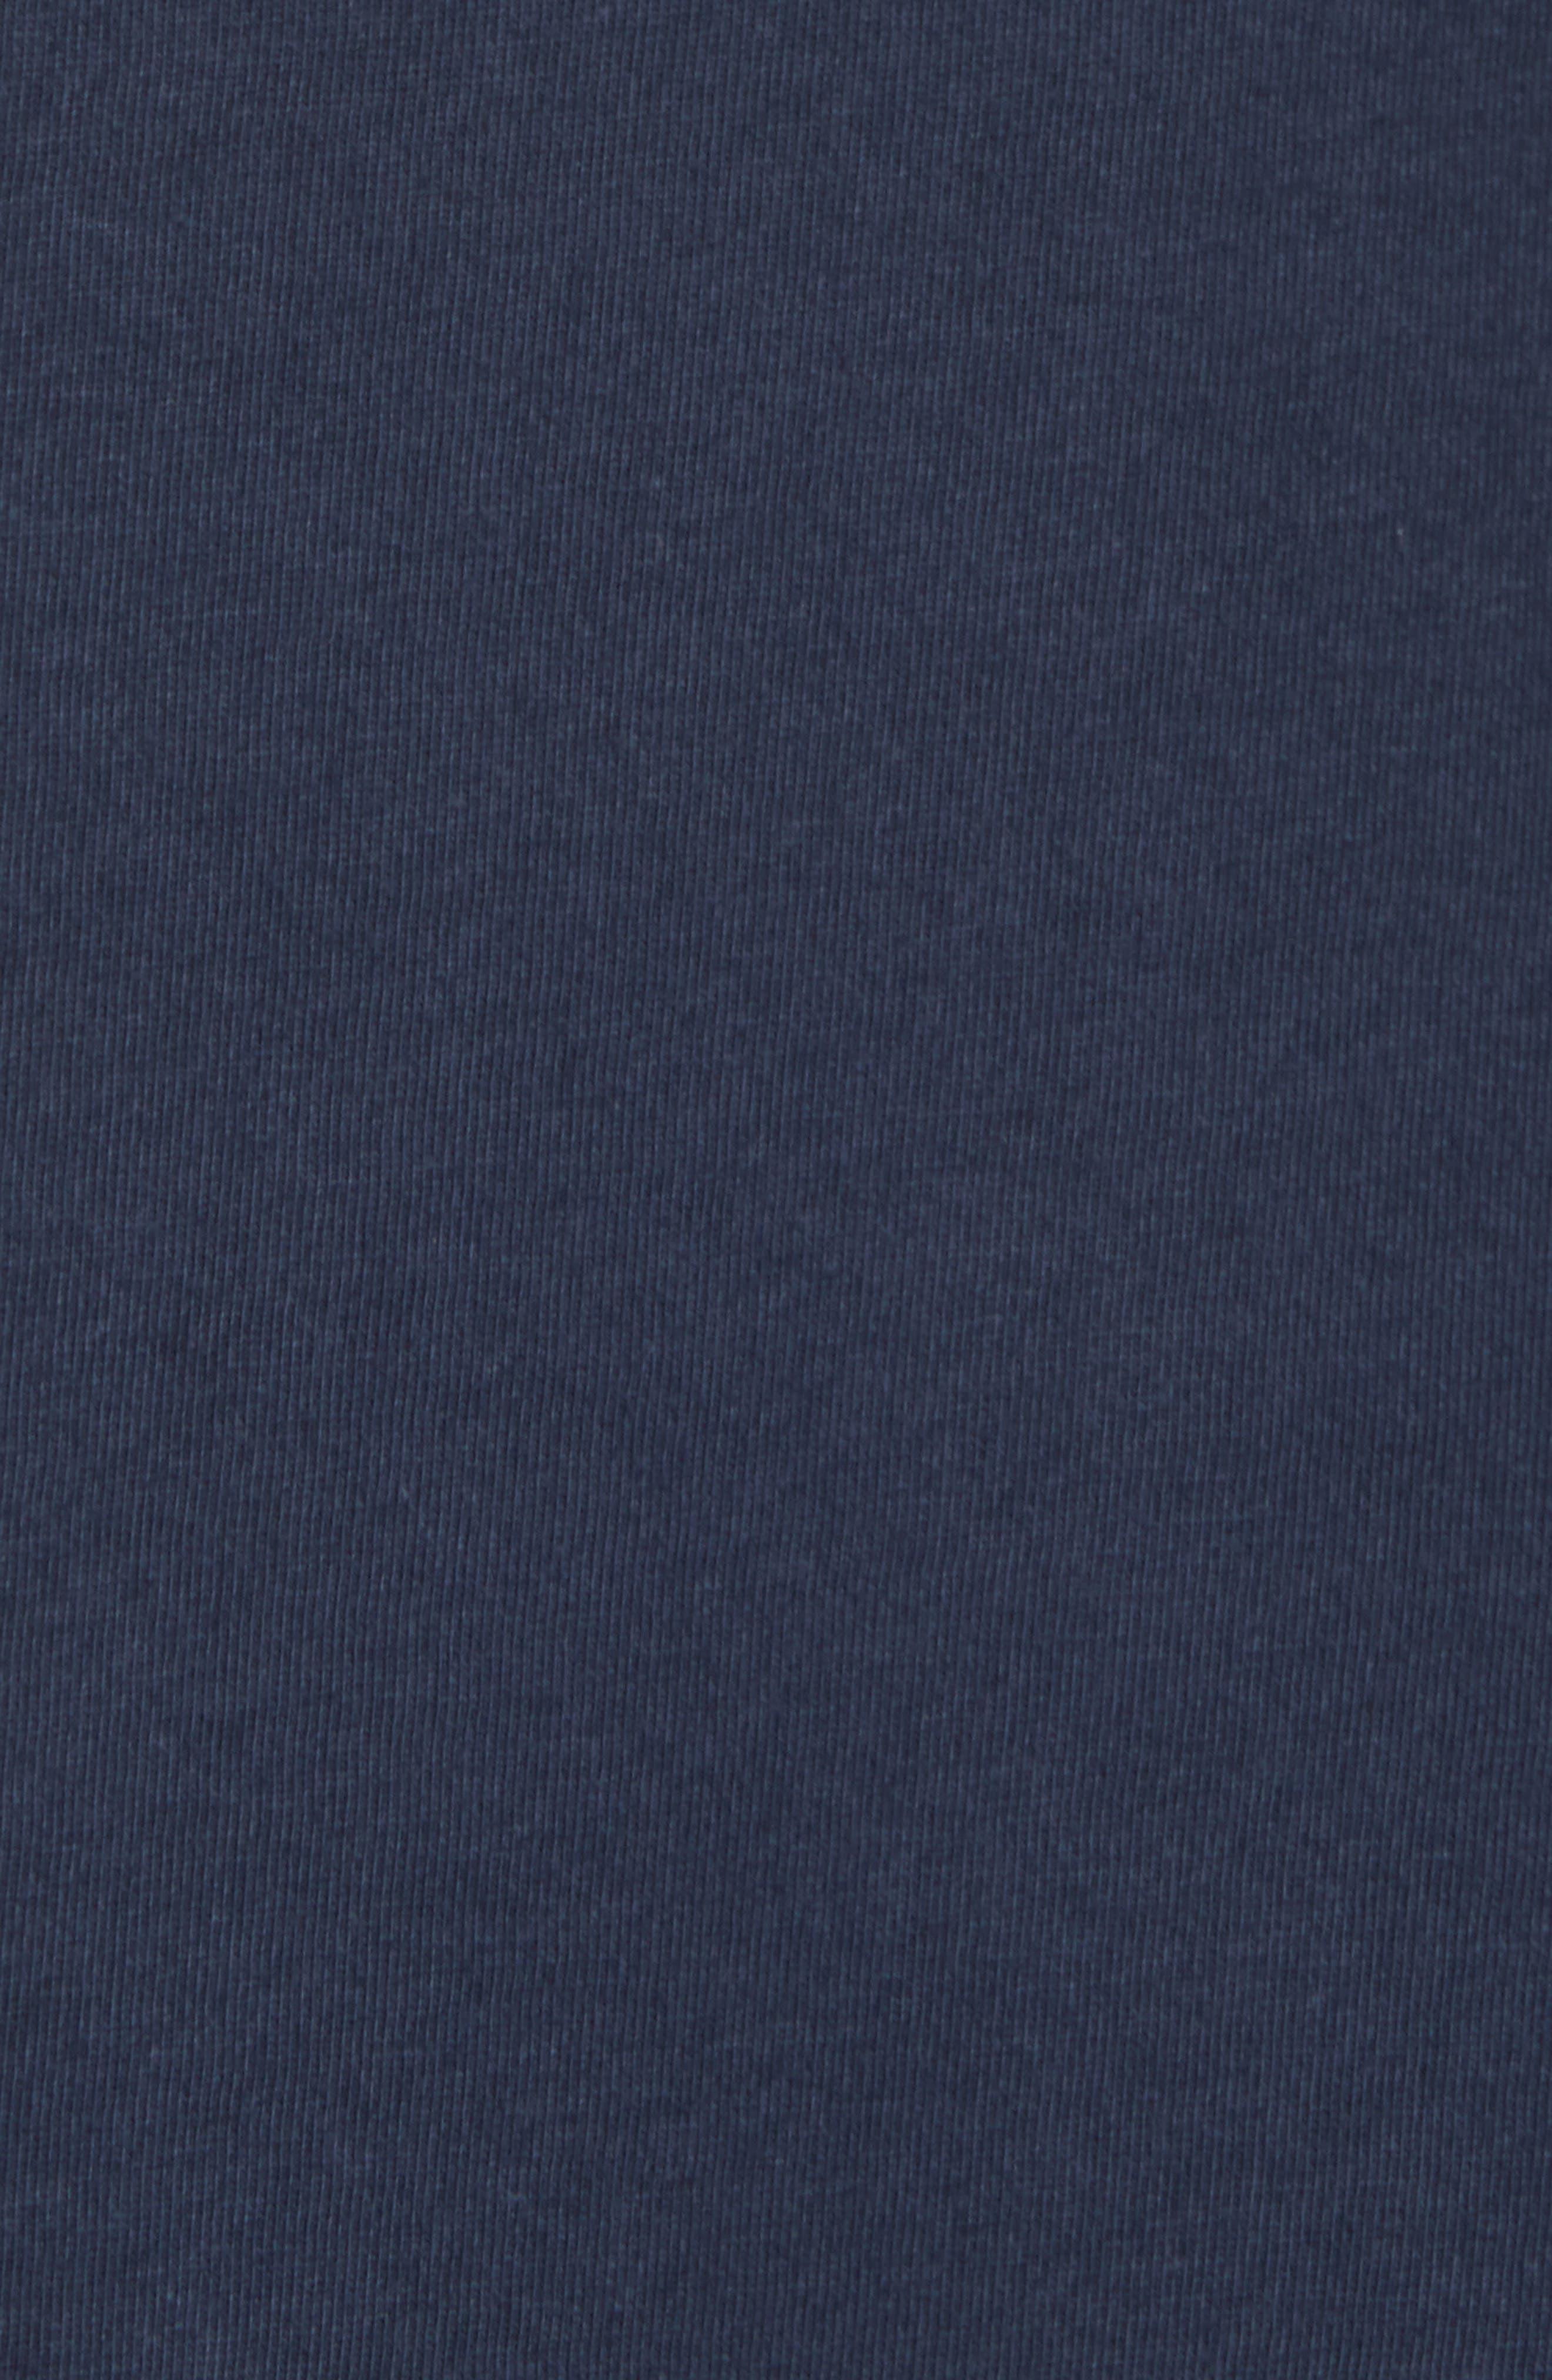 Alternate Image 5  - The North Face 1966 Box Crewneck Cotton T-Shirt